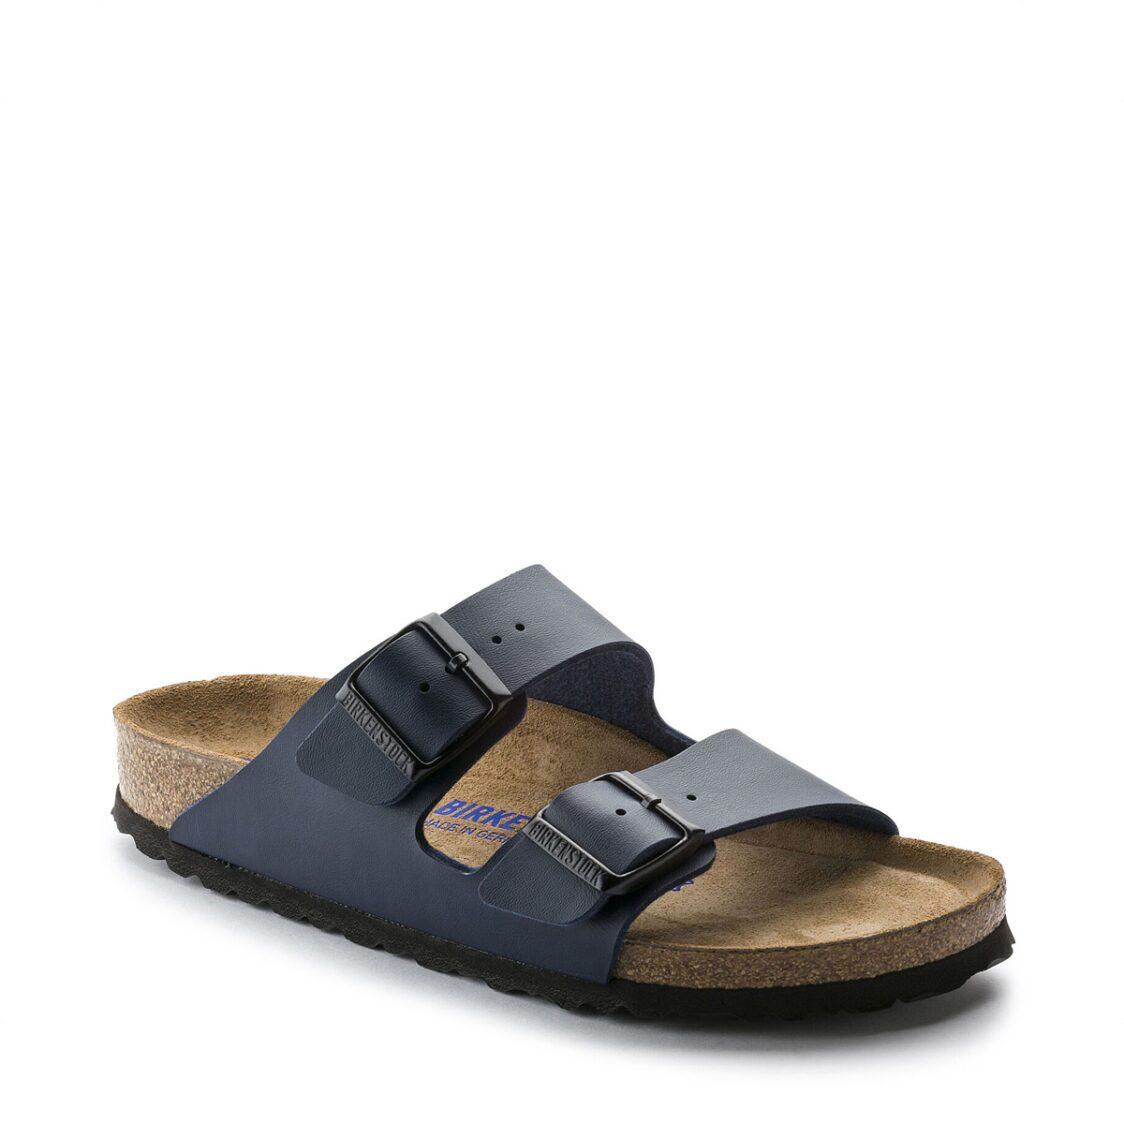 Birkenstock Arizona Birko-Flor Soft Footbed Unisex Regular Width Sandals in Blue